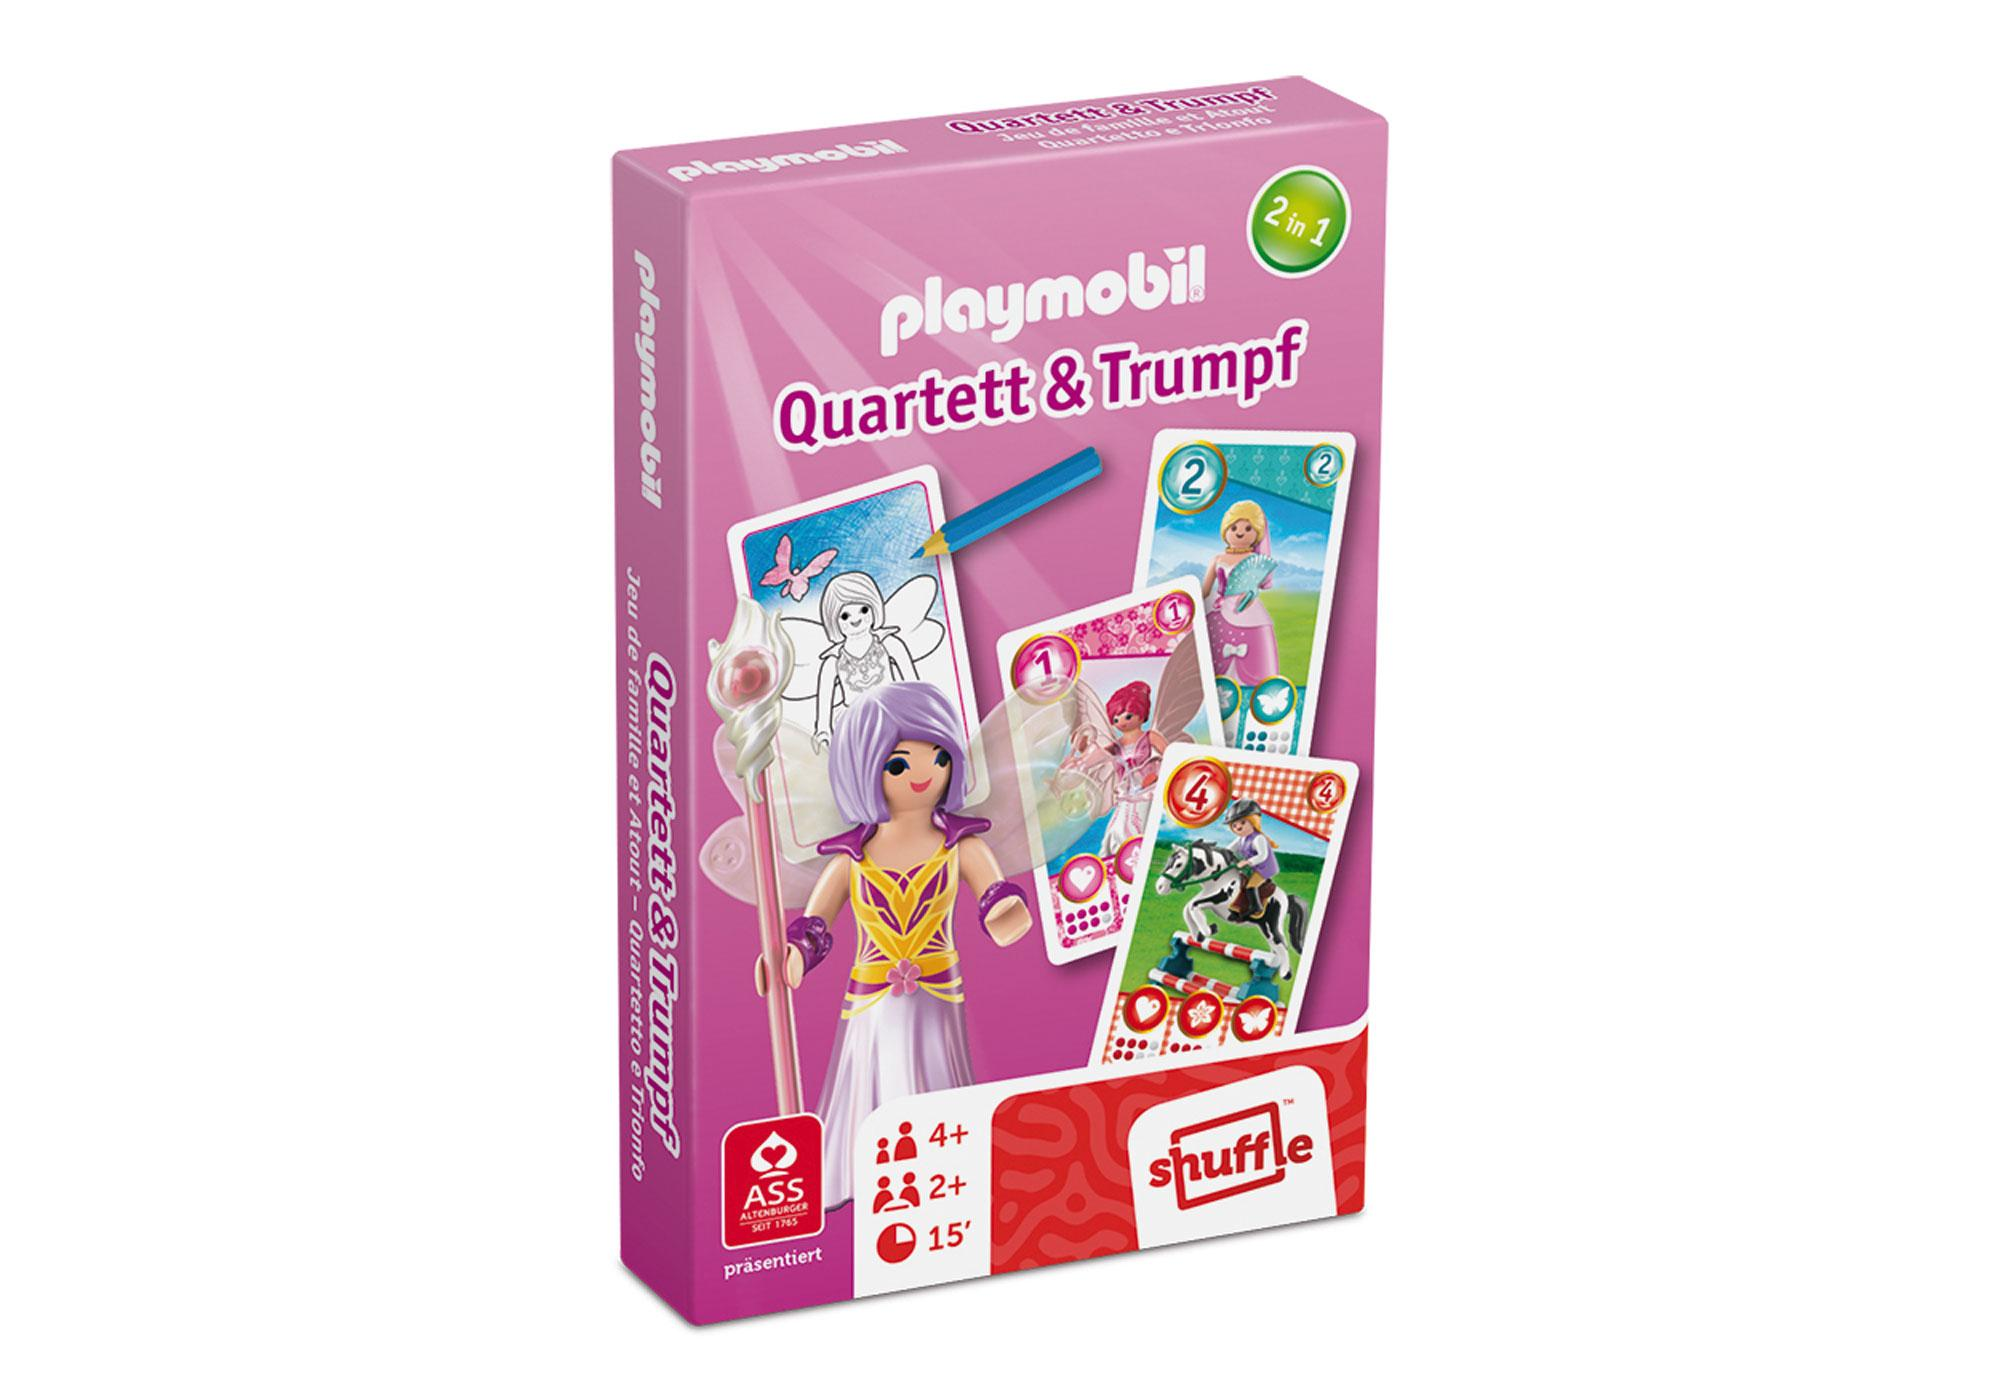 http://media.playmobil.com/i/playmobil/80094_product_detail/Quartett & Trumpf Girls